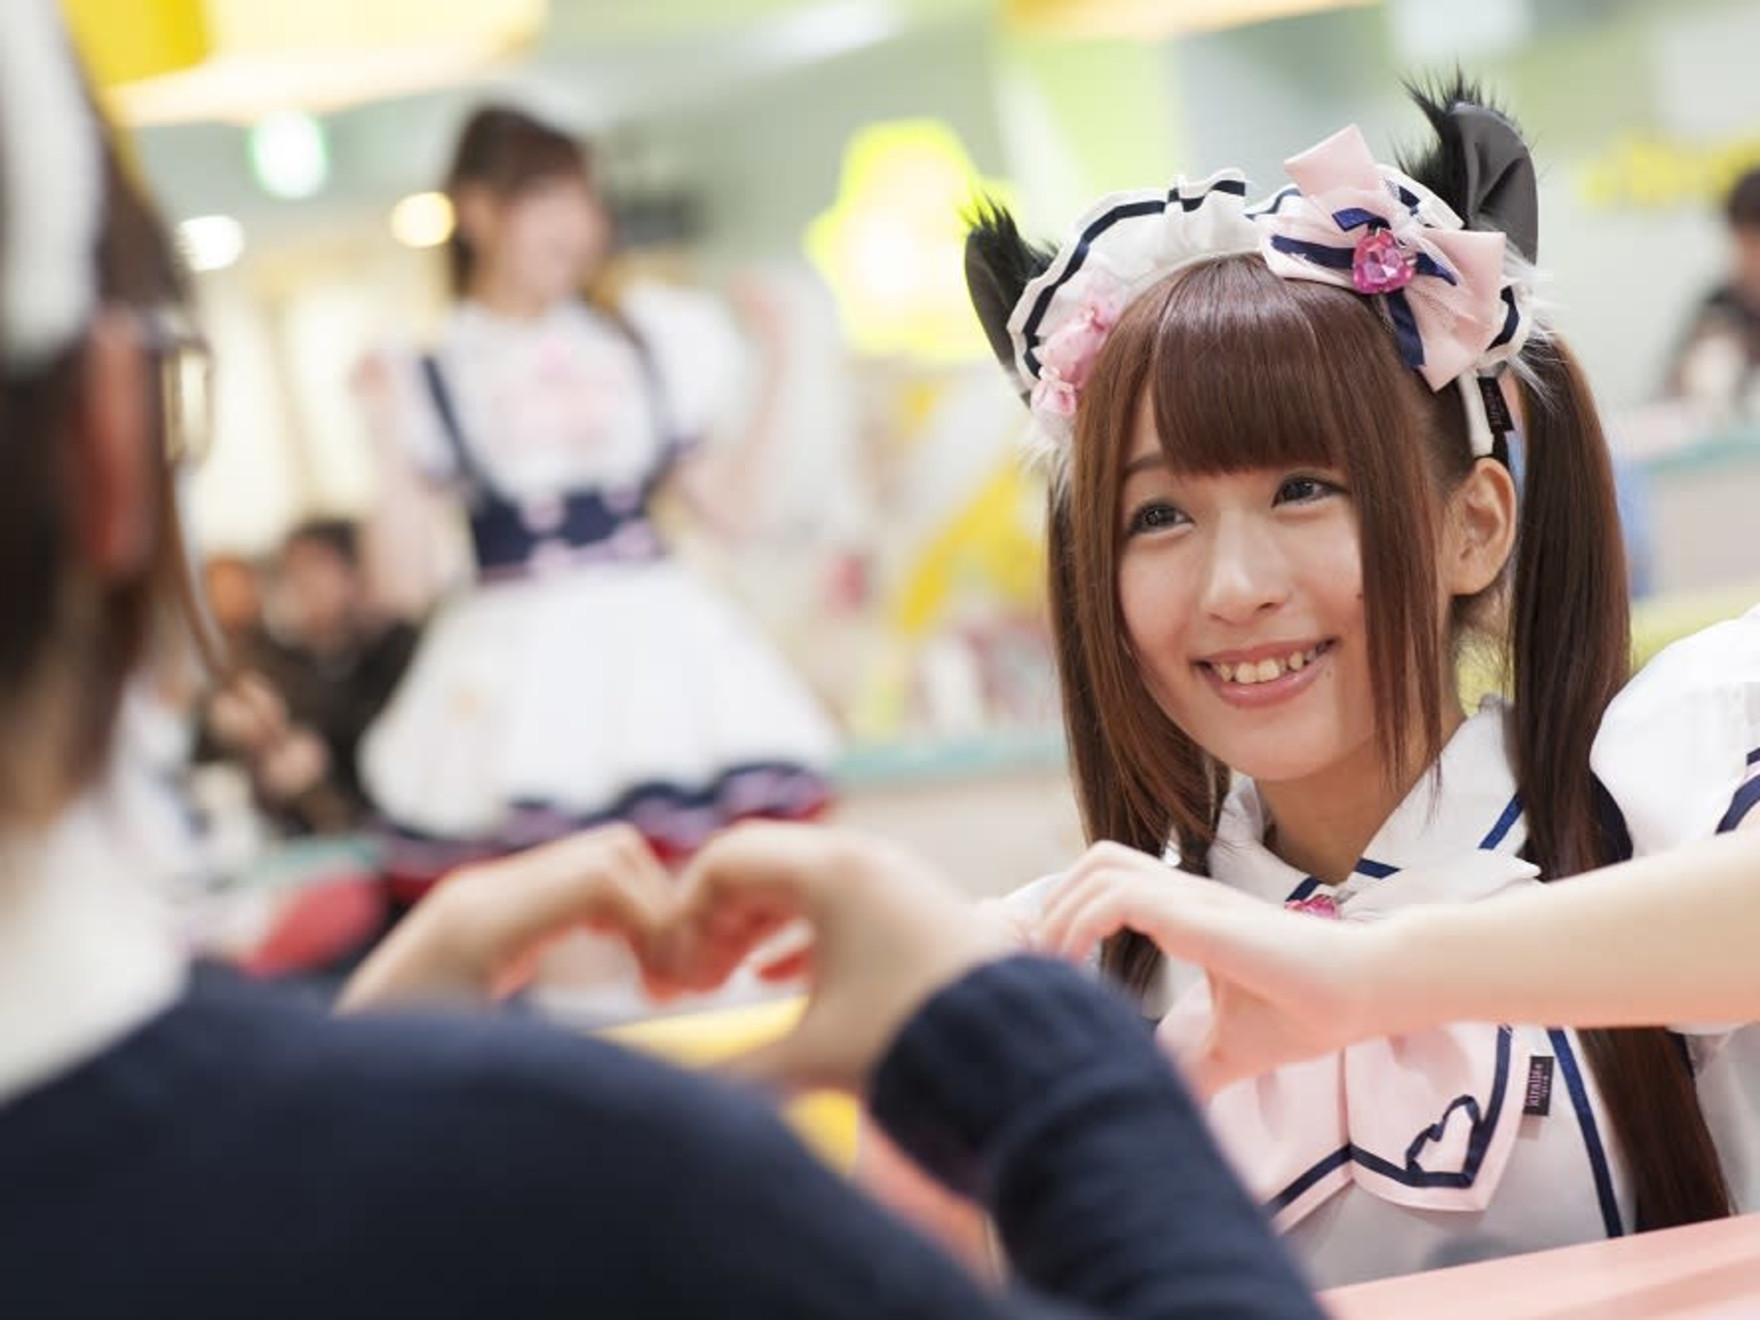 Maid Cafe Maidreamin in Akihabara/Shinjuku/Ikebukuro/Shibuya - 5